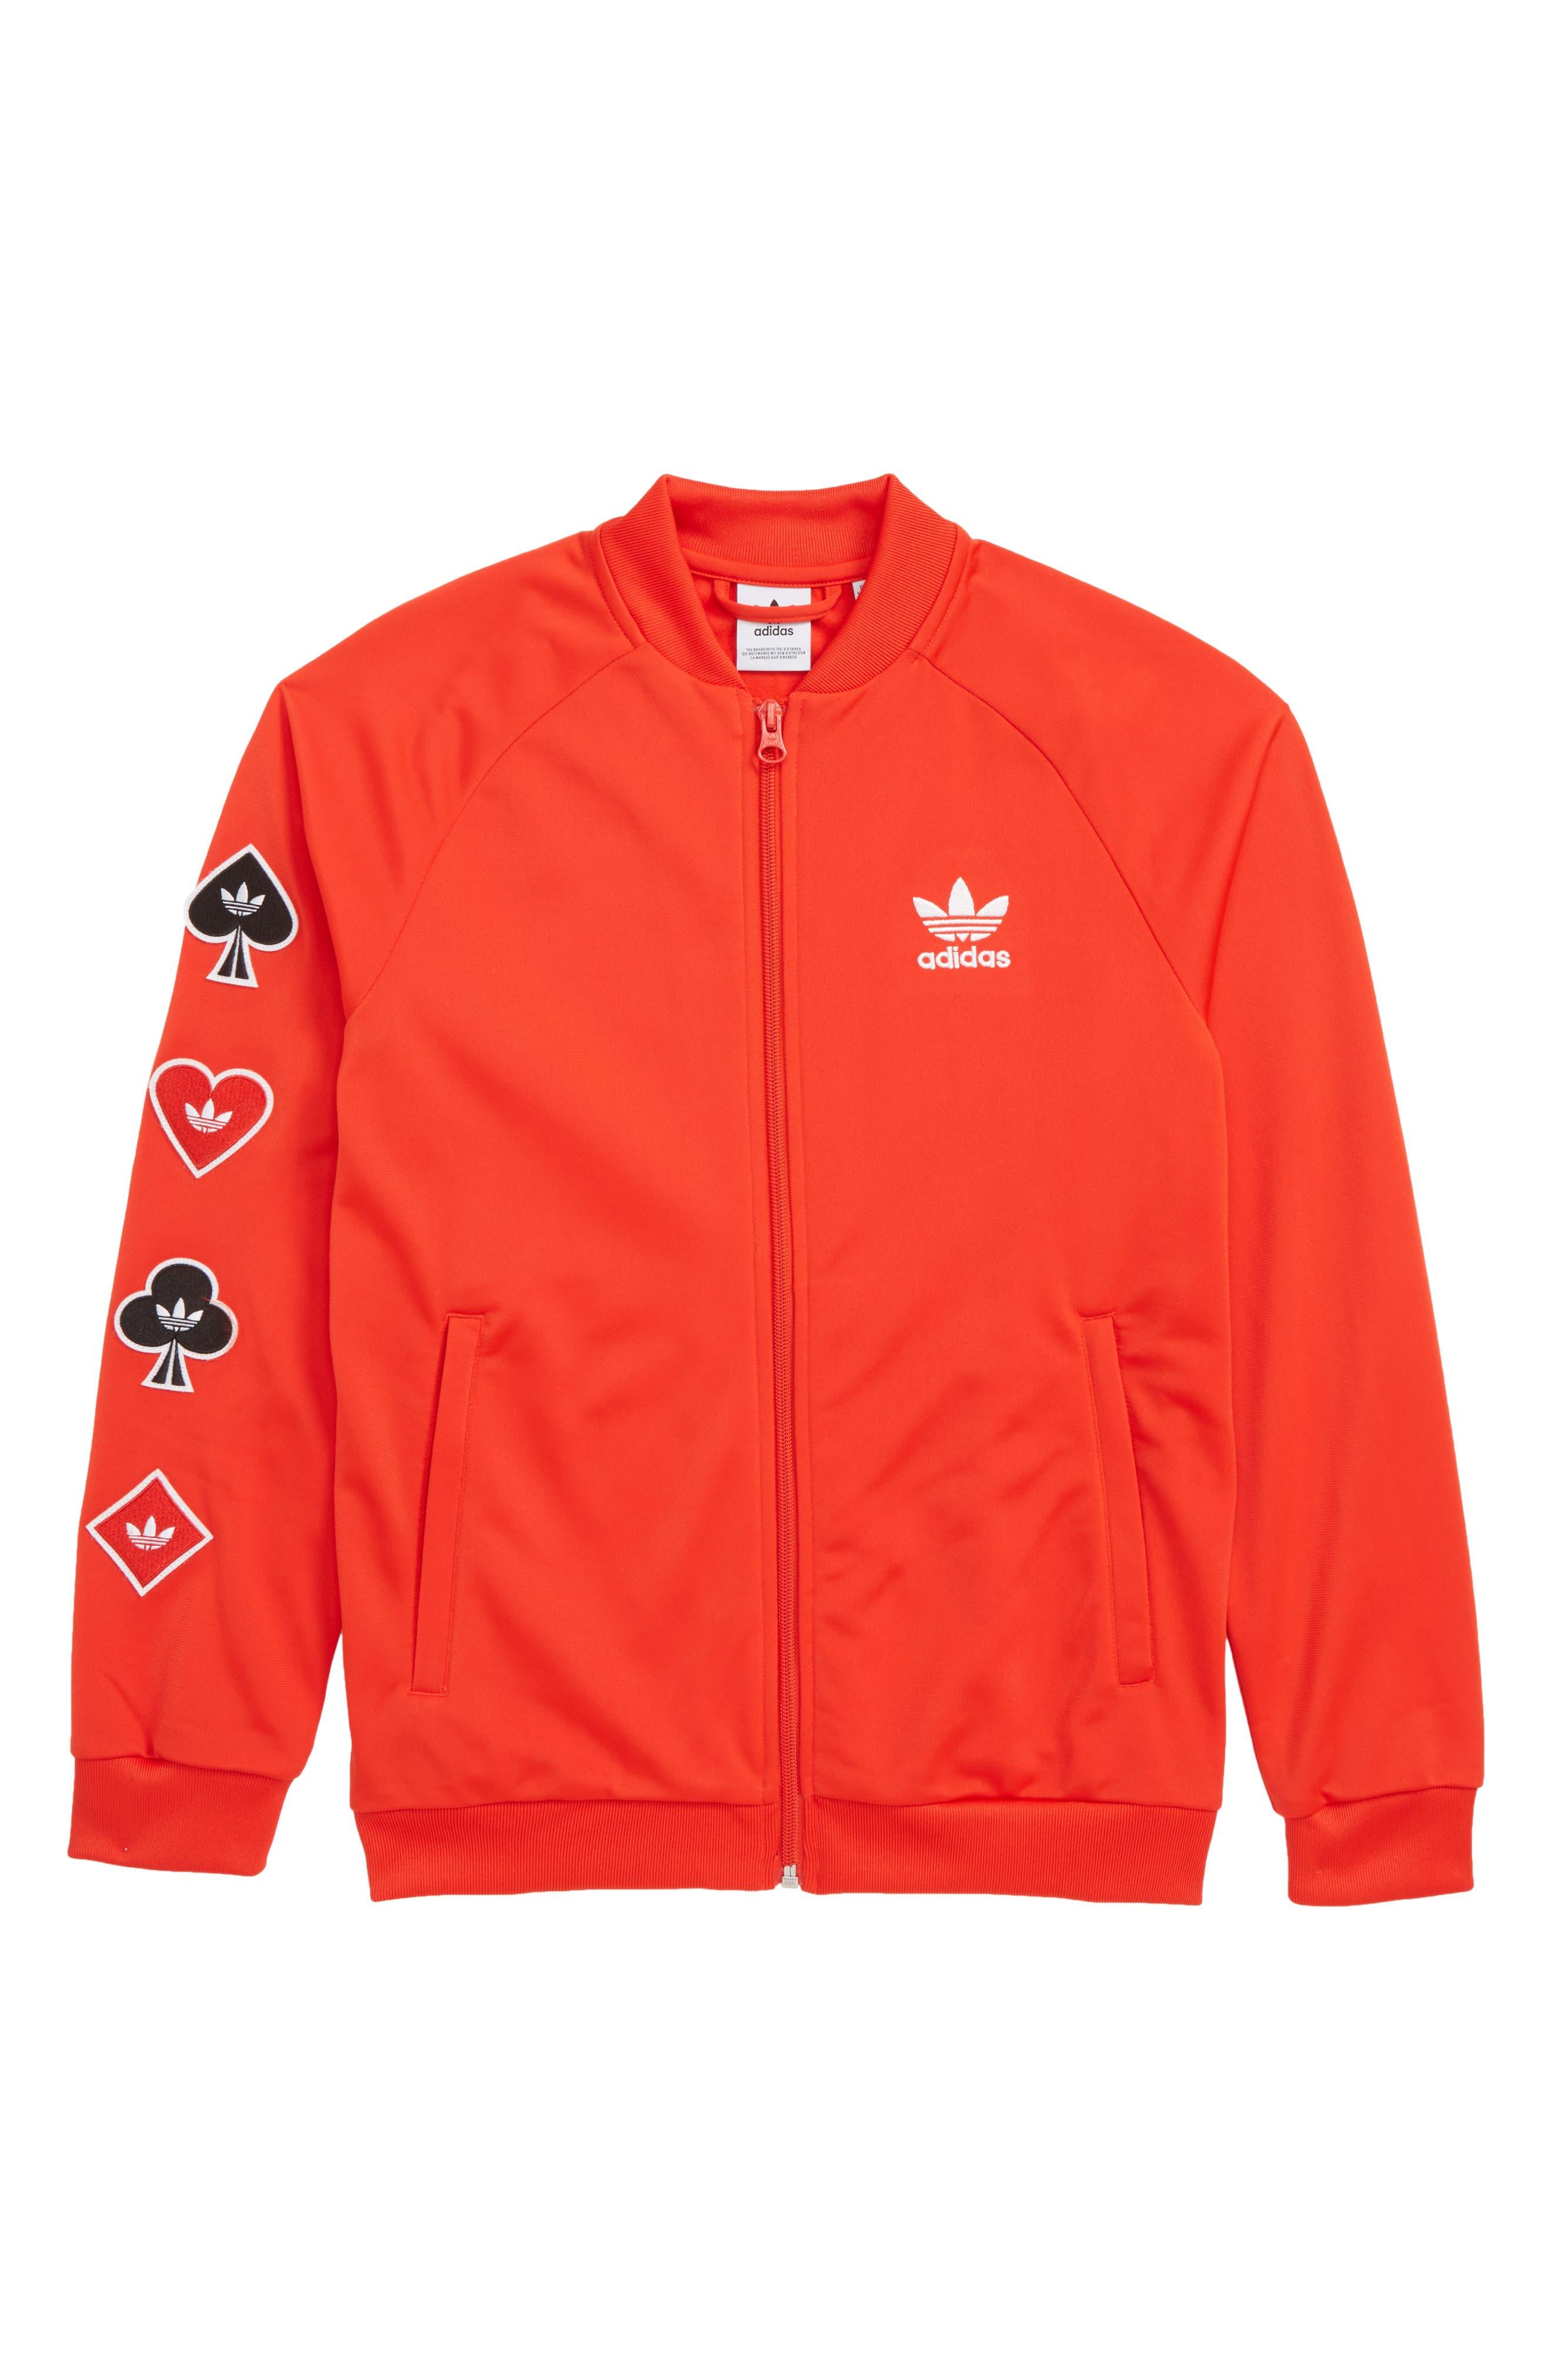 ADIDAS ORIGINALS V-Day Superstar Jacket, Main, color, ACTIVE RED